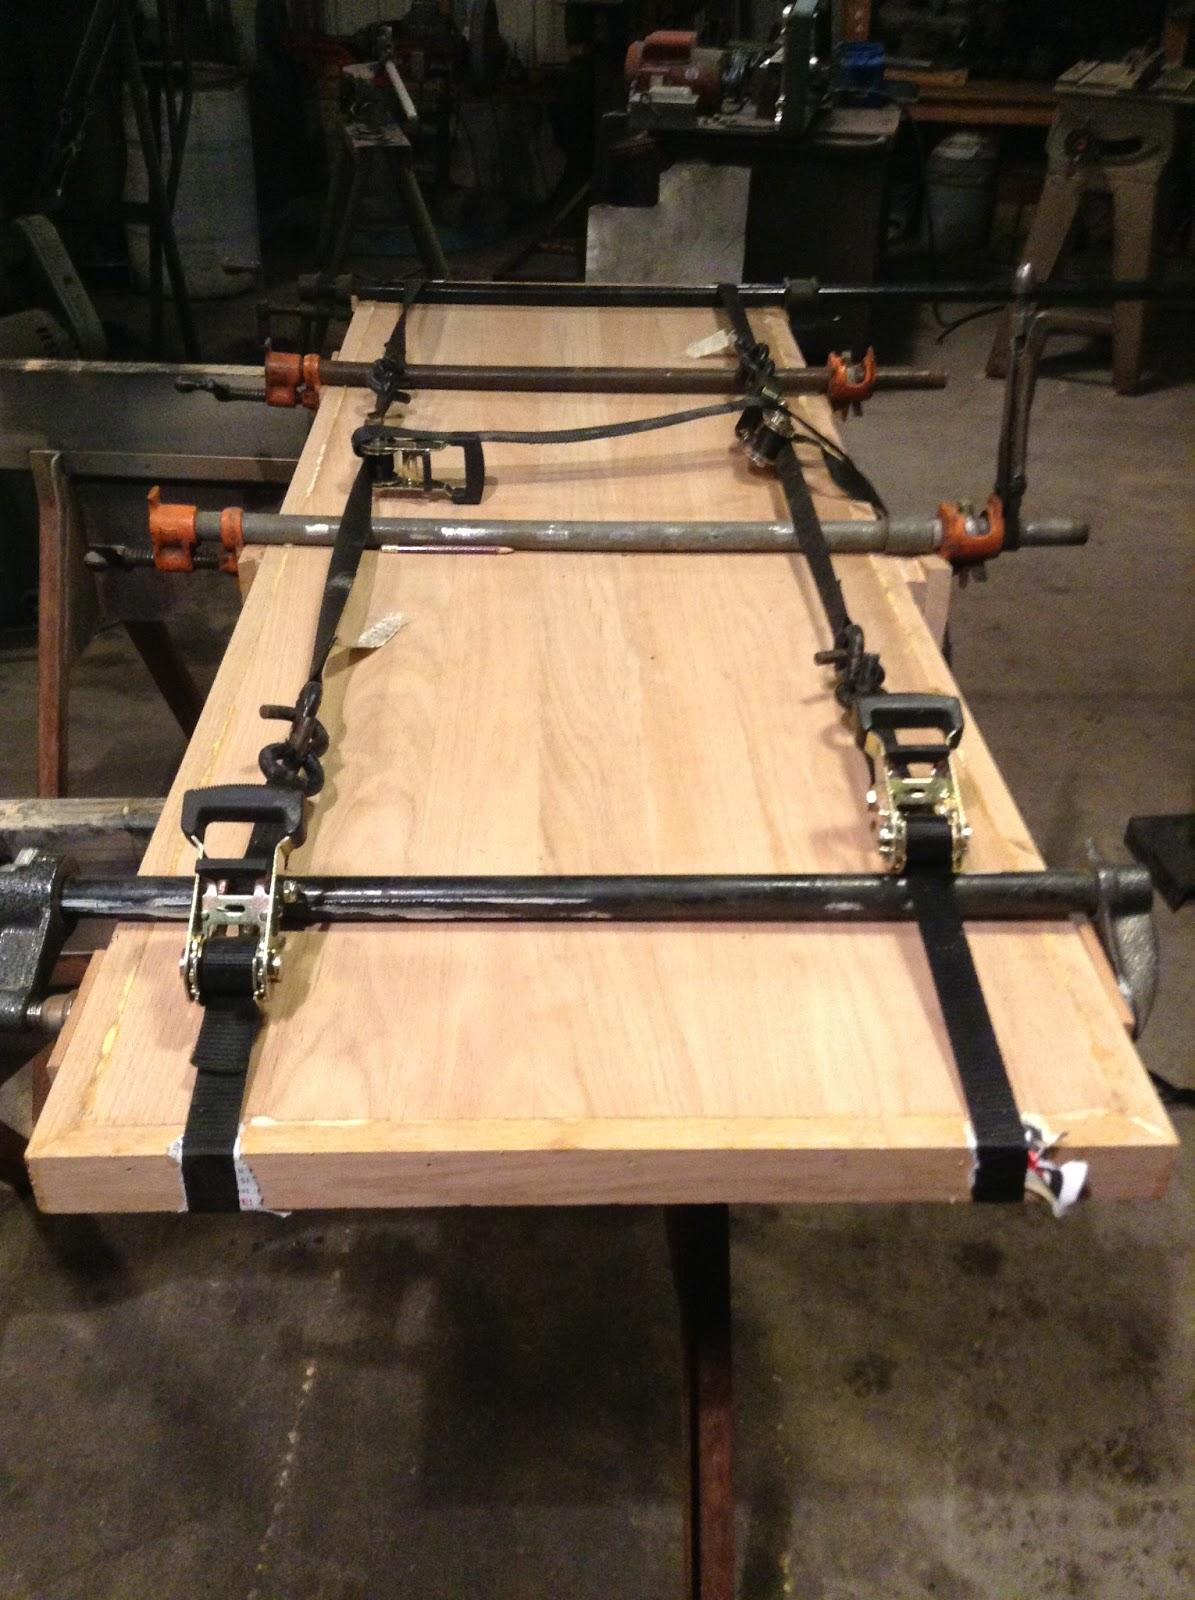 Blacksmith's Table Stock Image - Image: 29006231